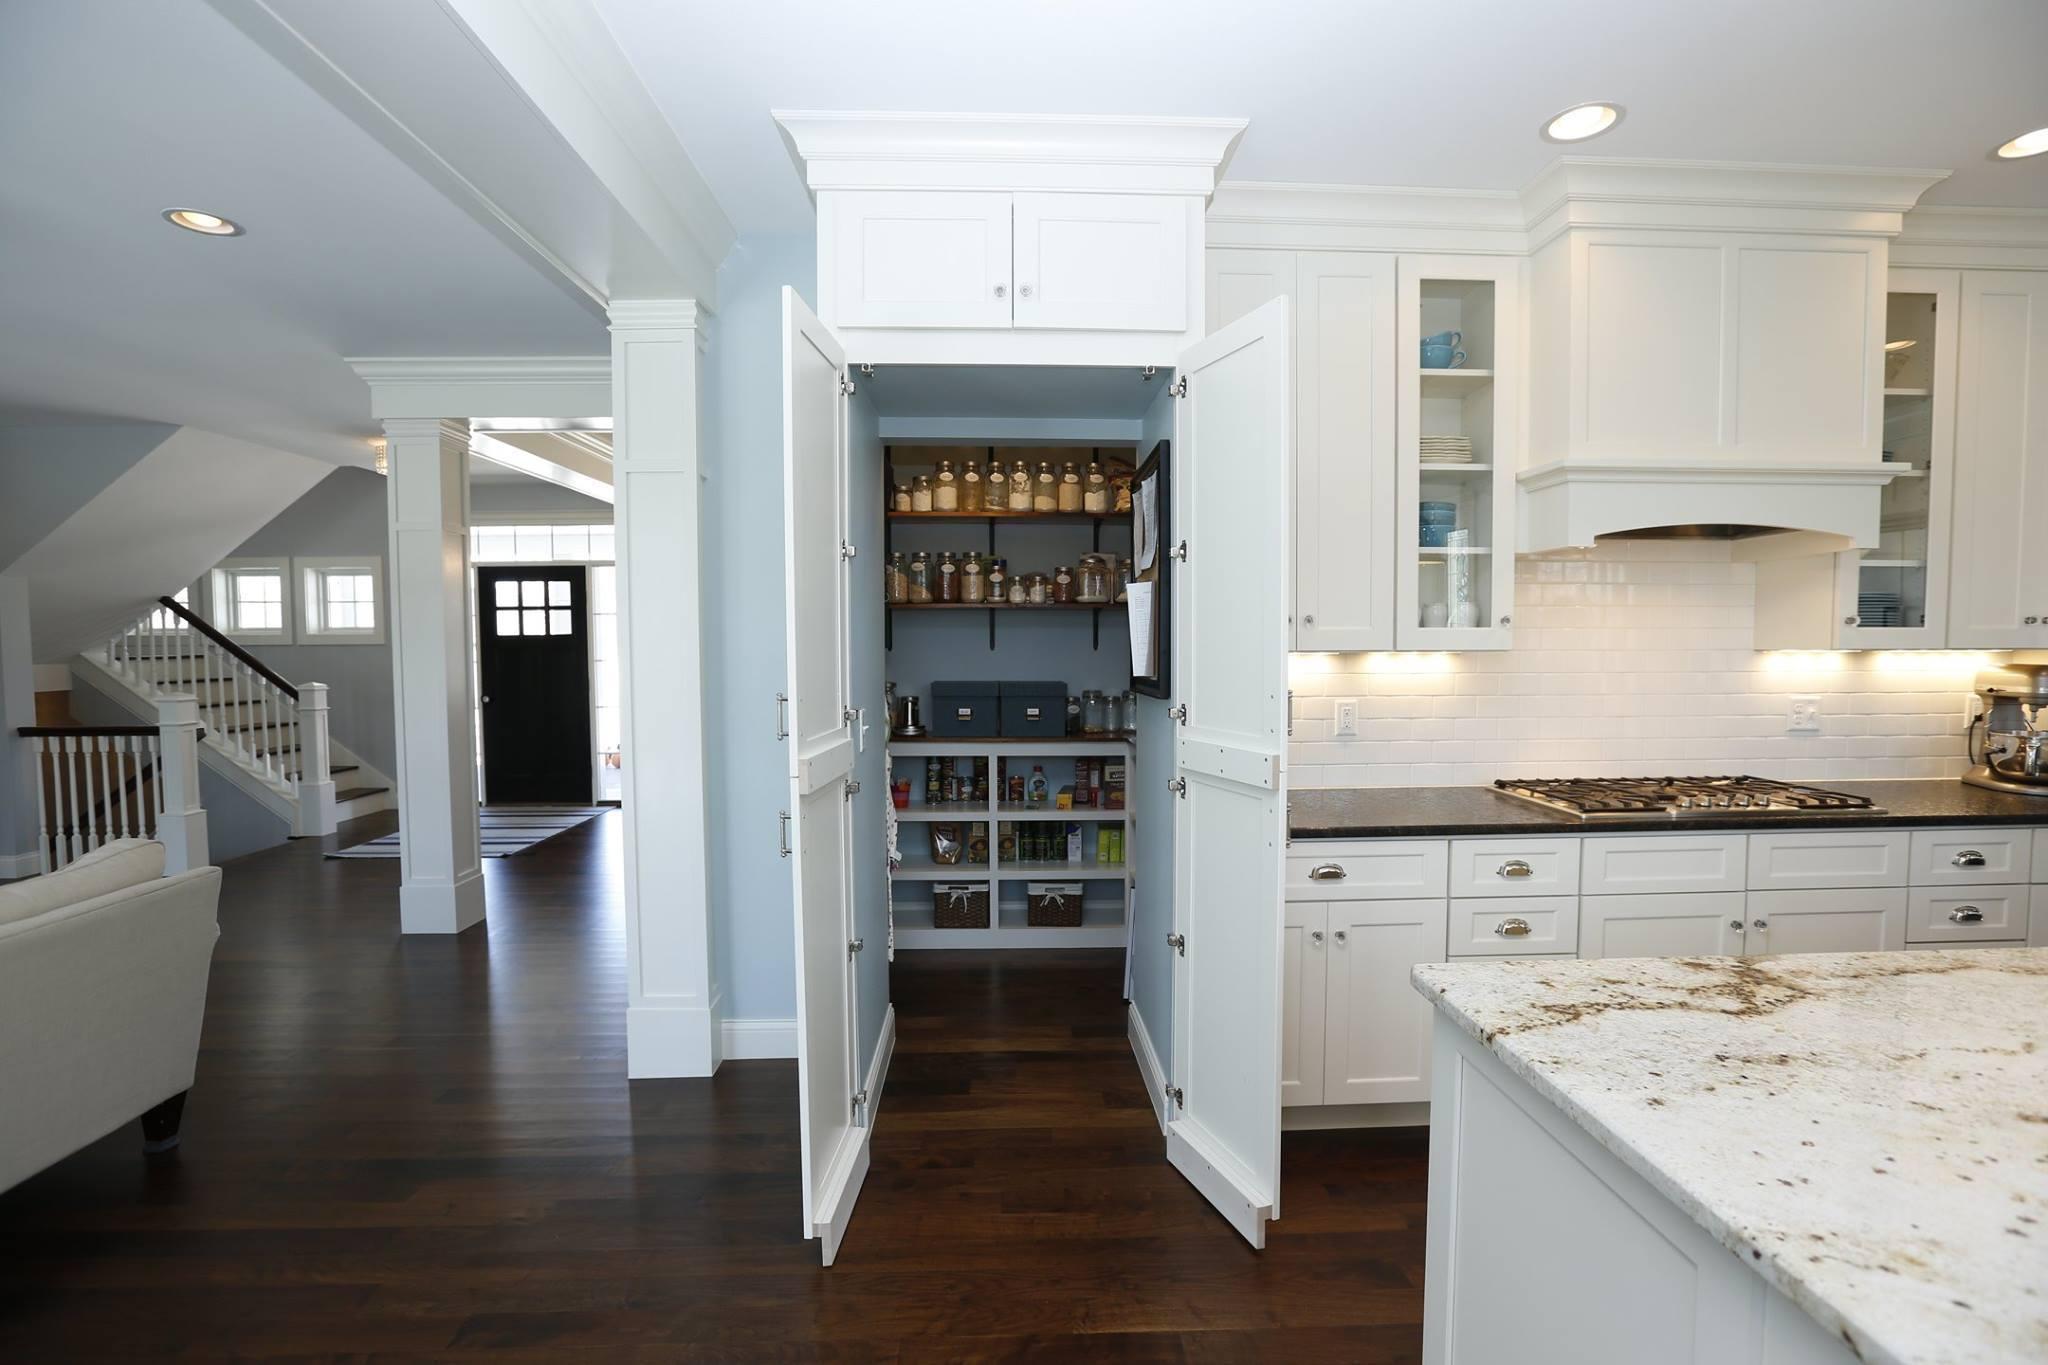 Highlands designs custom kitchen cabinets kitchen - Highlands designs custom kitchen cabinets ...